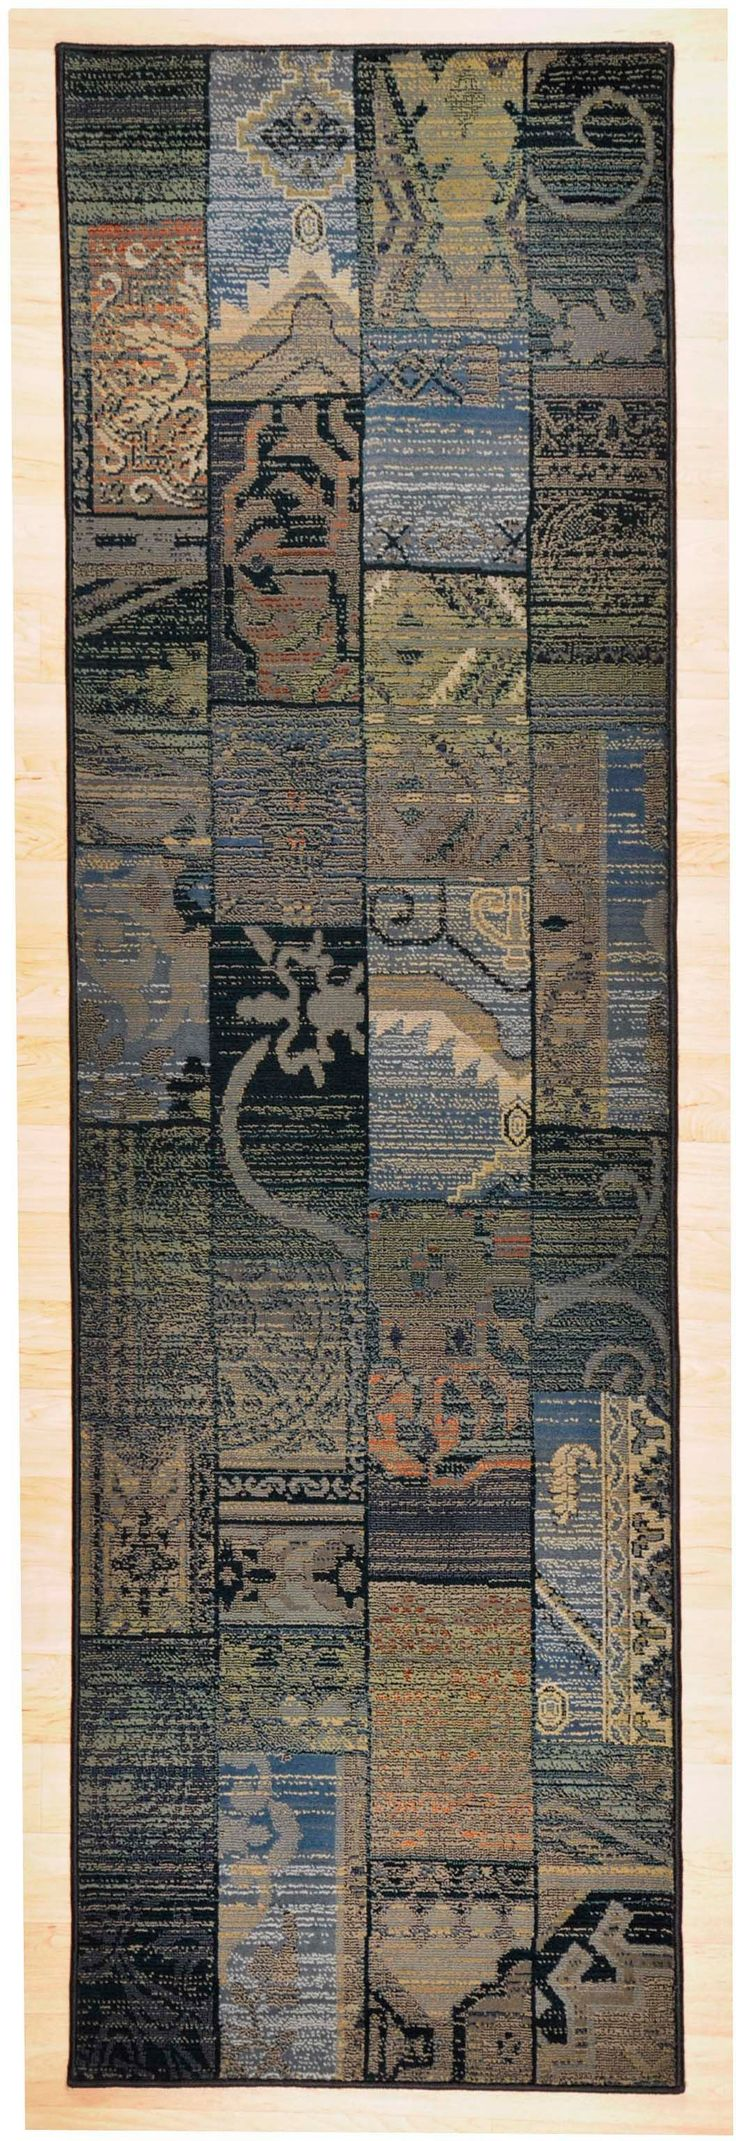 Oriental Weavers Läufer »Gabiro 5504« blau, B/L: 68x235cm, 12mm, strapazierfähig, Ökotex100 zertifiziert Jetzt bestellen unter: https://moebel.ladendirekt.de/heimtextilien/teppiche/laeufer/?uid=bbecec28-1850-5876-a627-6d6015149f54&utm_source=pinterest&utm_medium=pin&utm_campaign=boards #laeufer #heimtextilien #teppiche